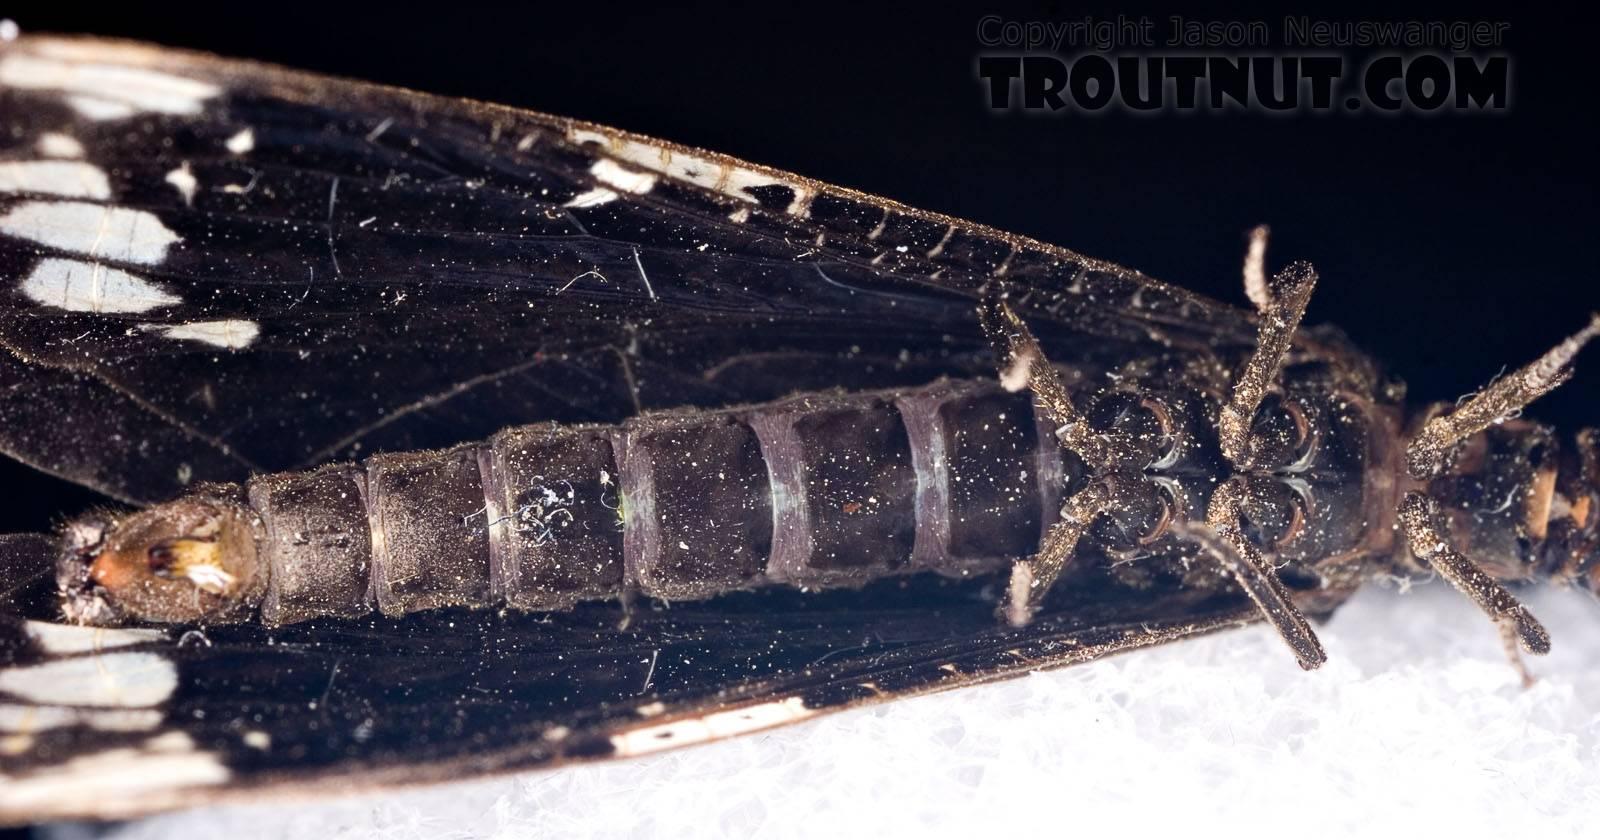 Male Nigronia serricornis (Fishfly) Hellgrammite Adult from Brodhead Creek in Pennsylvania